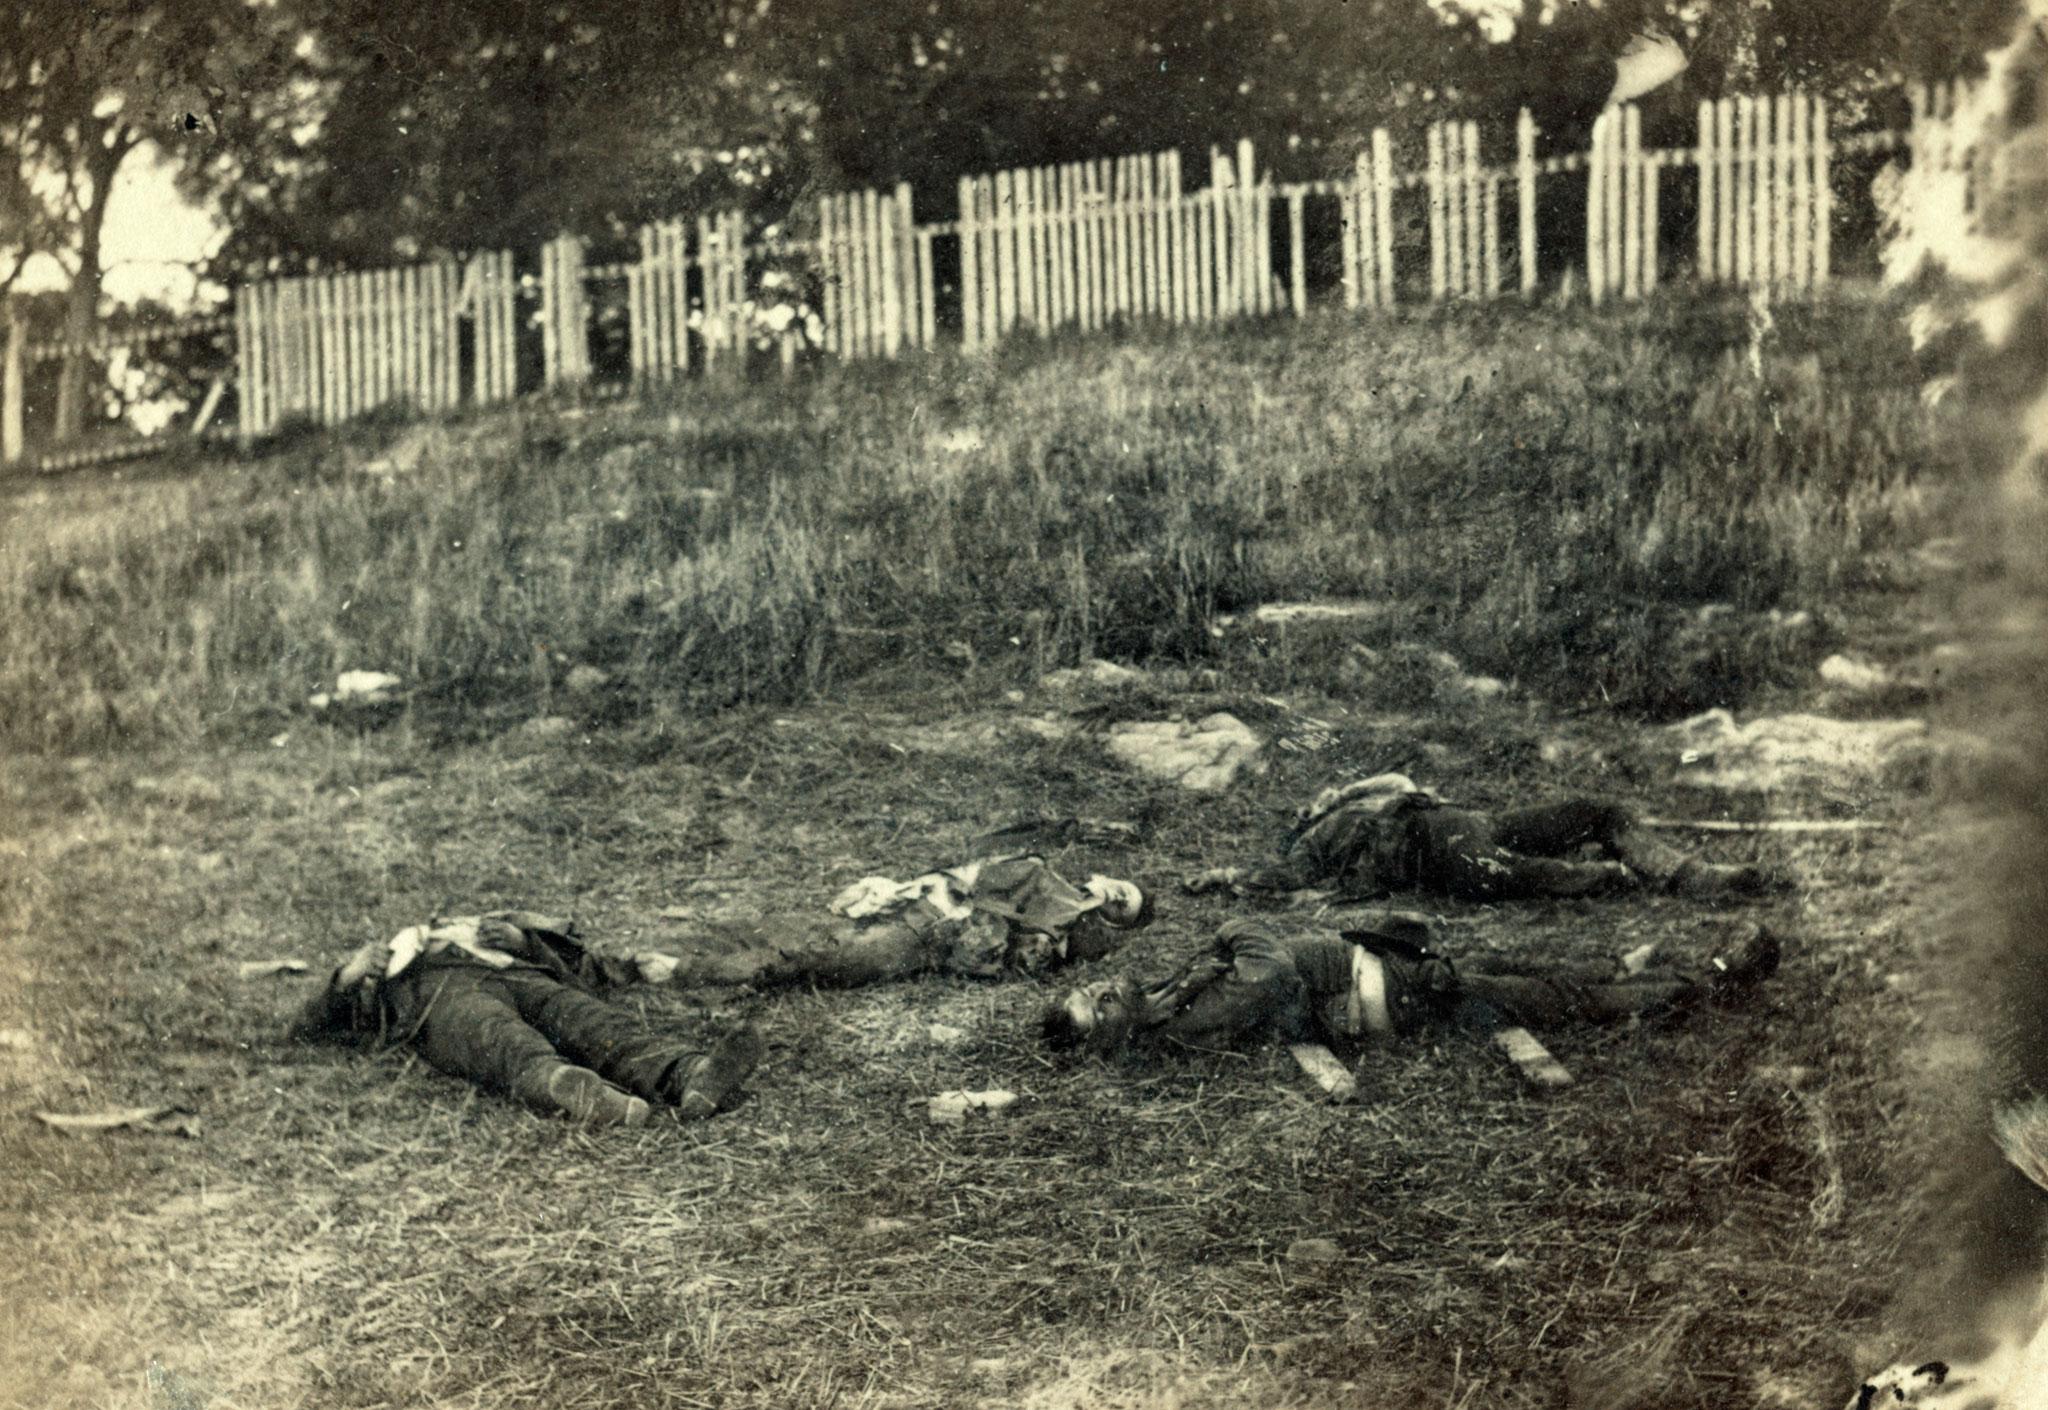 The Battlefield of Antietam, 1862, by Alexander Gardner. Library of Congress.